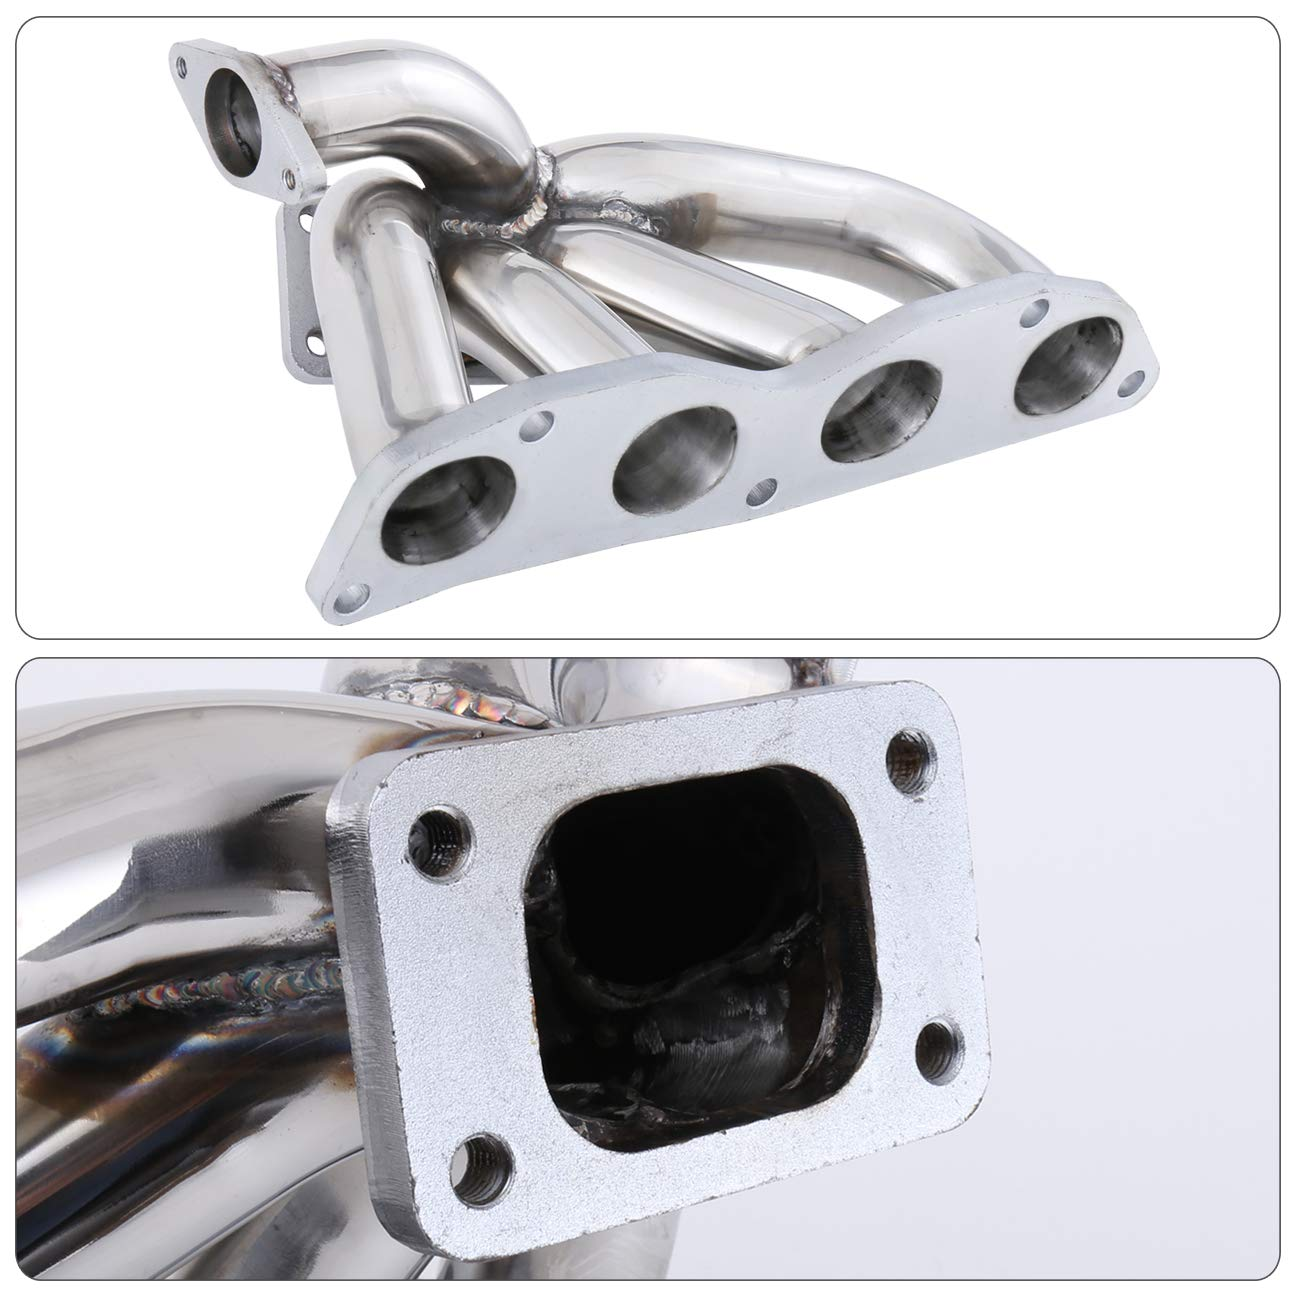 AJP Distributors T3 Turbo Manifold Stainless Steel High Performance Upgrade Fits 2.0L K20A2 K20A3 K20Z1 K20Z3 DOHC 2002-2011 Honda Civic Si Acura RSX EP3 FA5 FG2 DC5